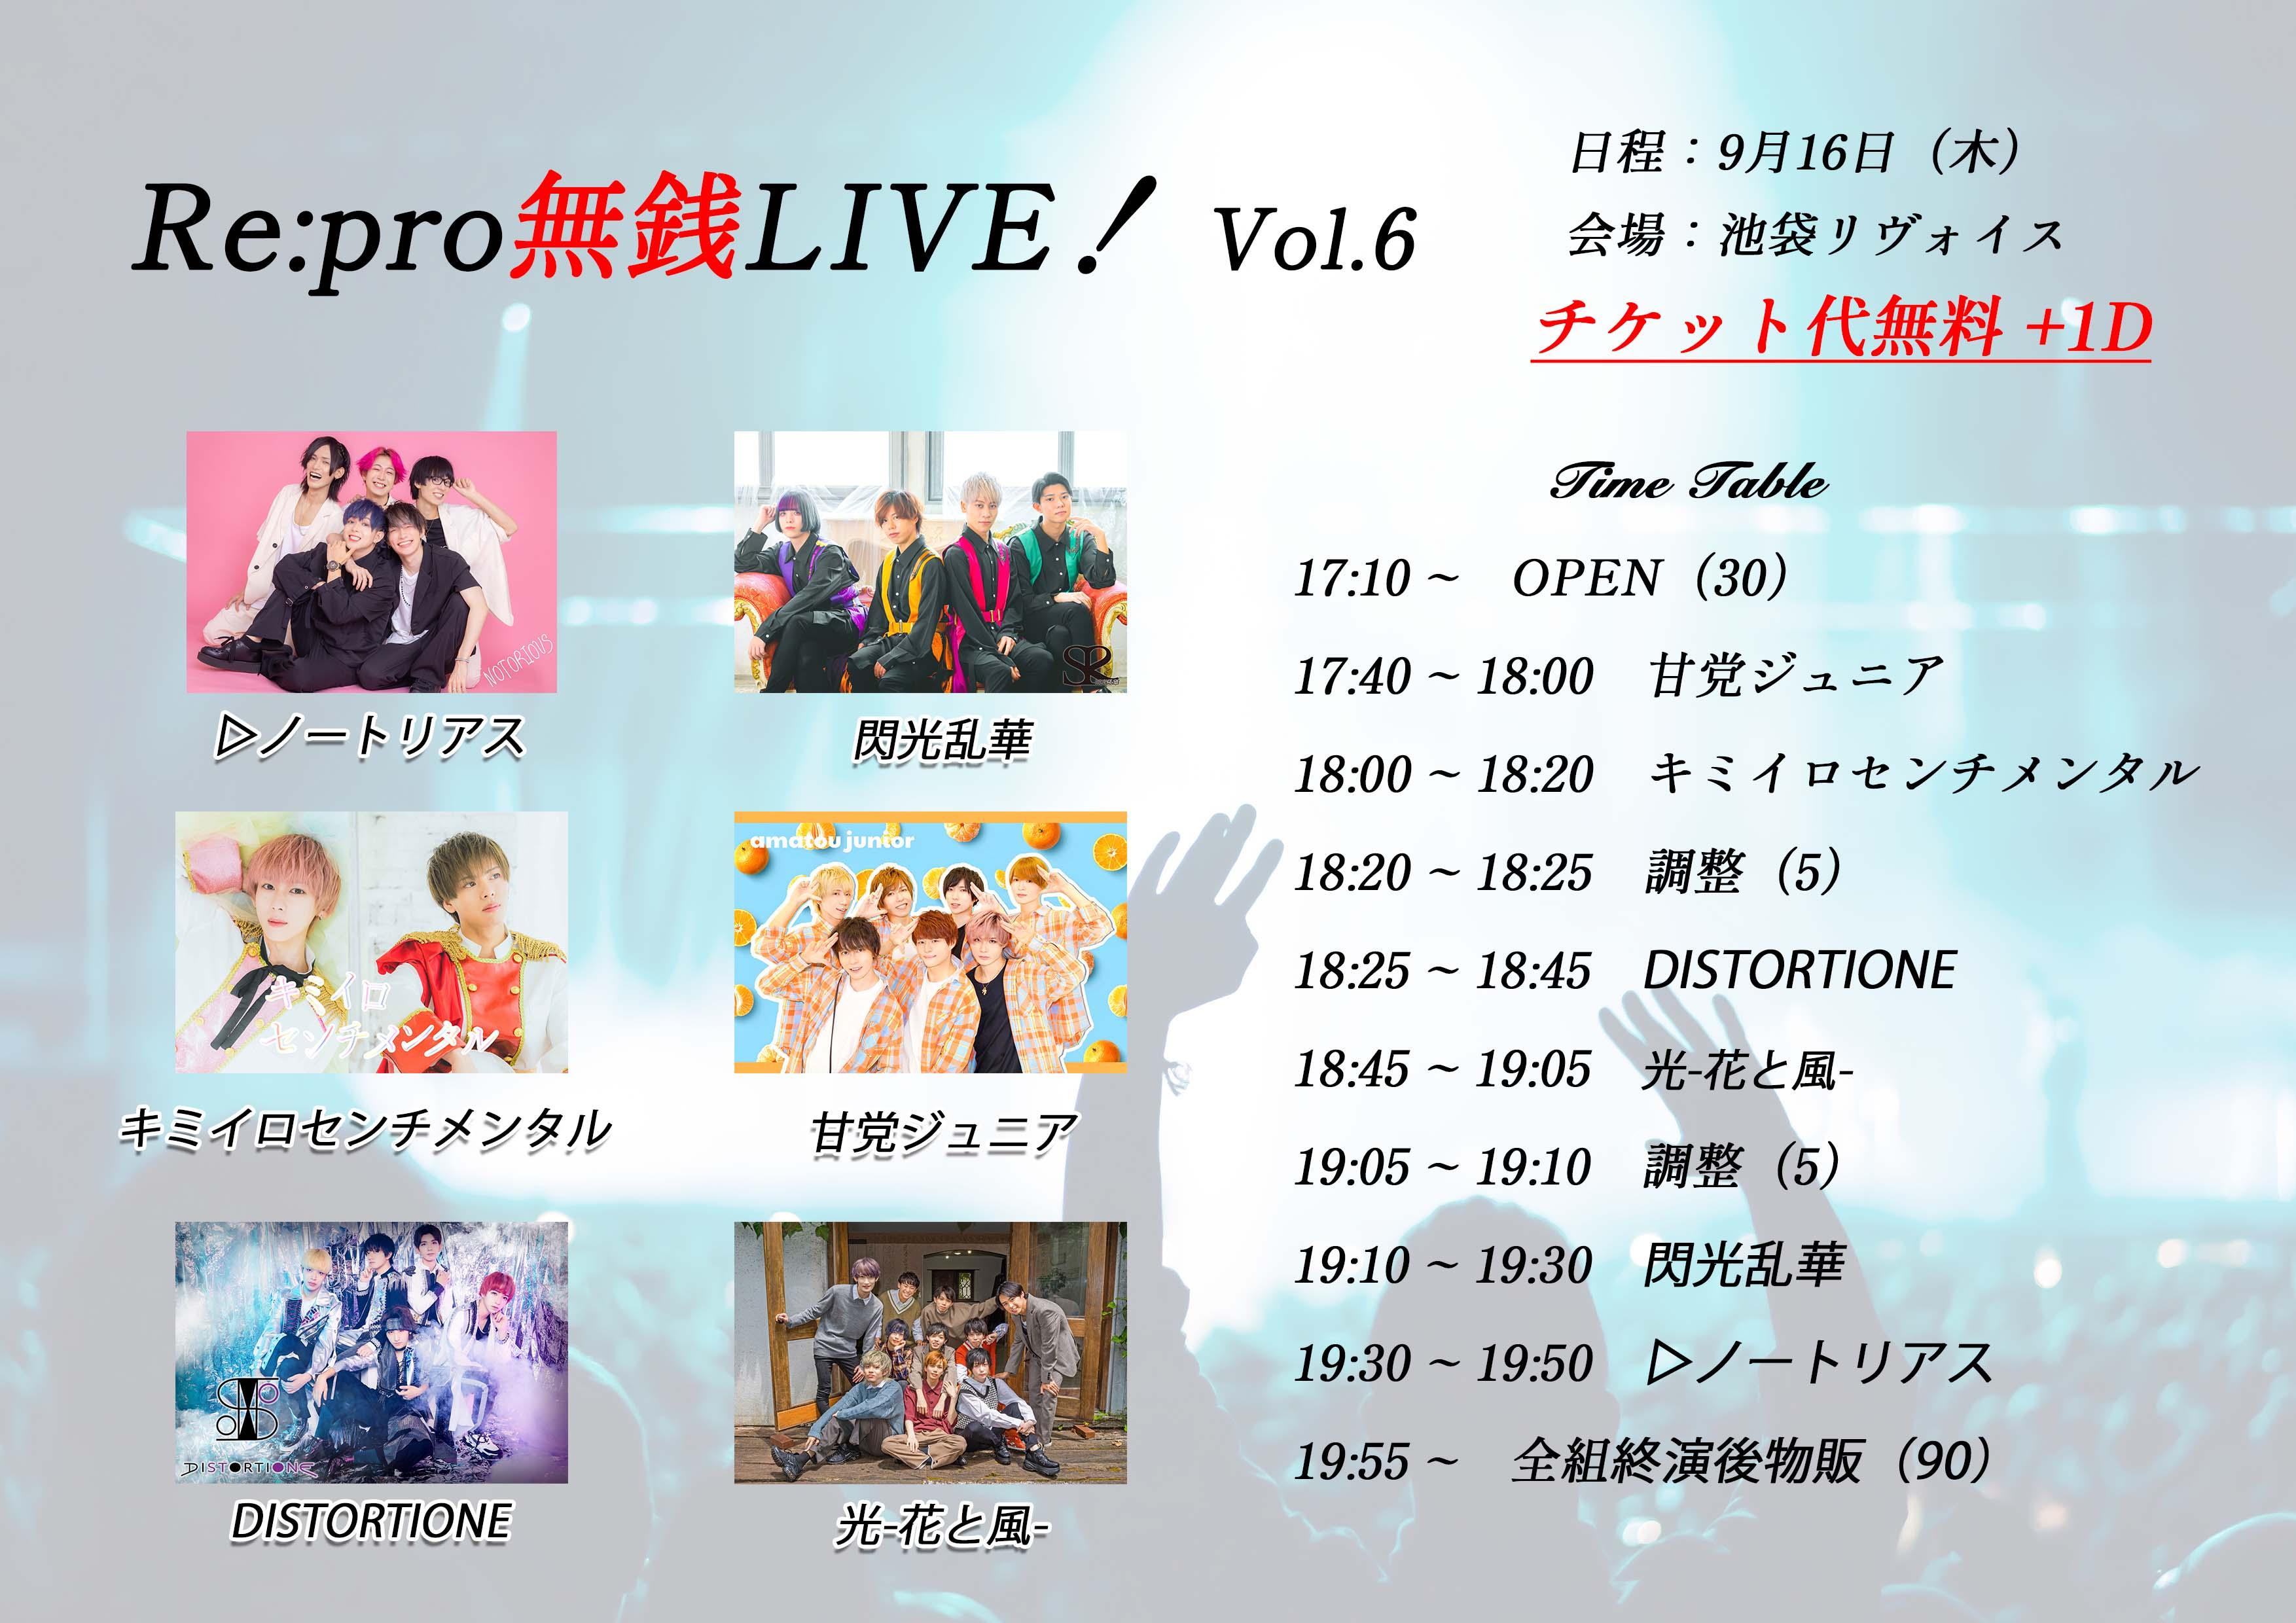 Re:pro無銭LIVE! Vol.6